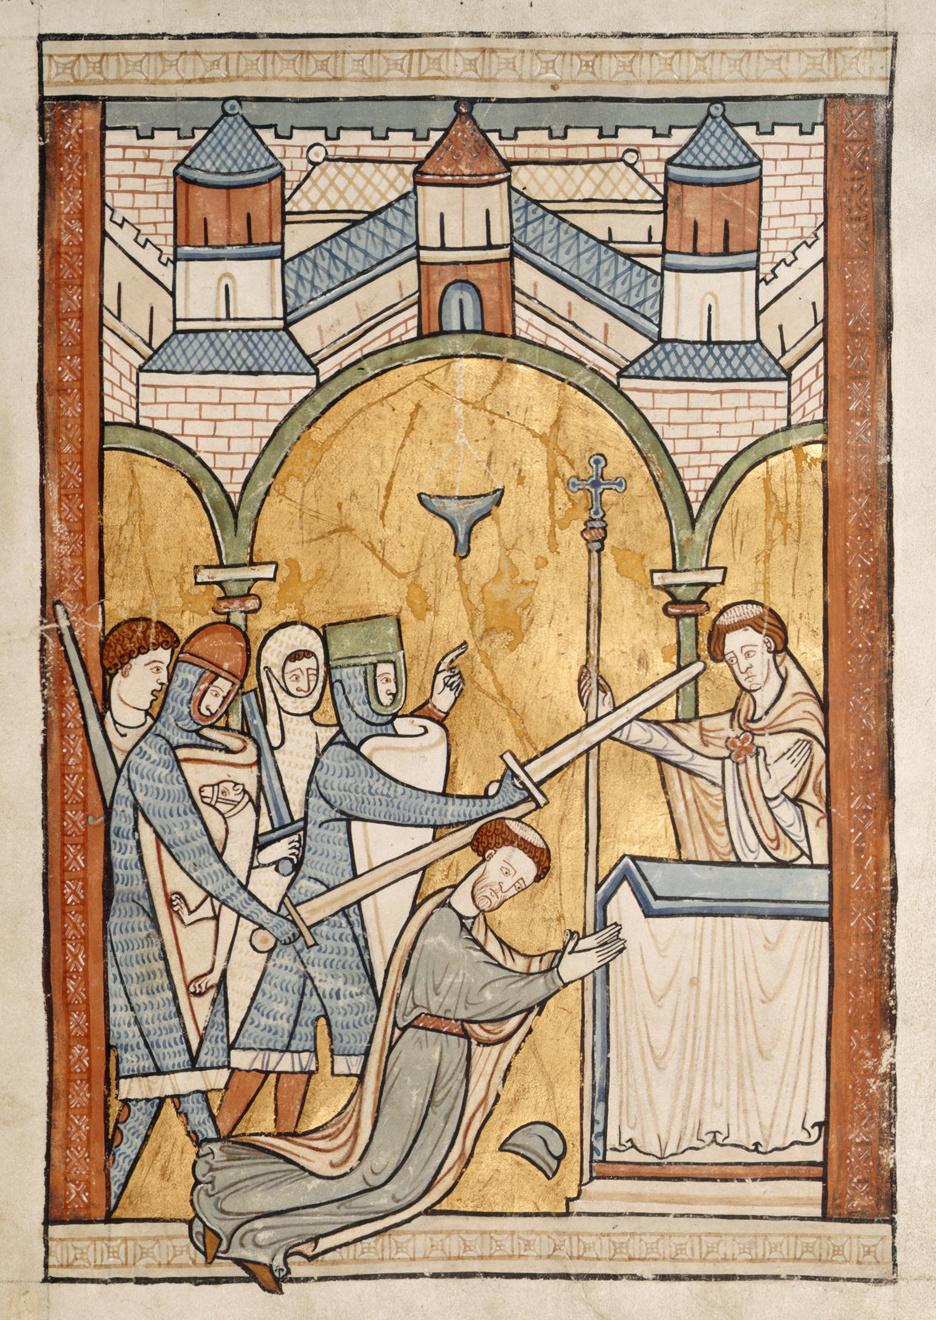 Martyrdom and Church growth image 2